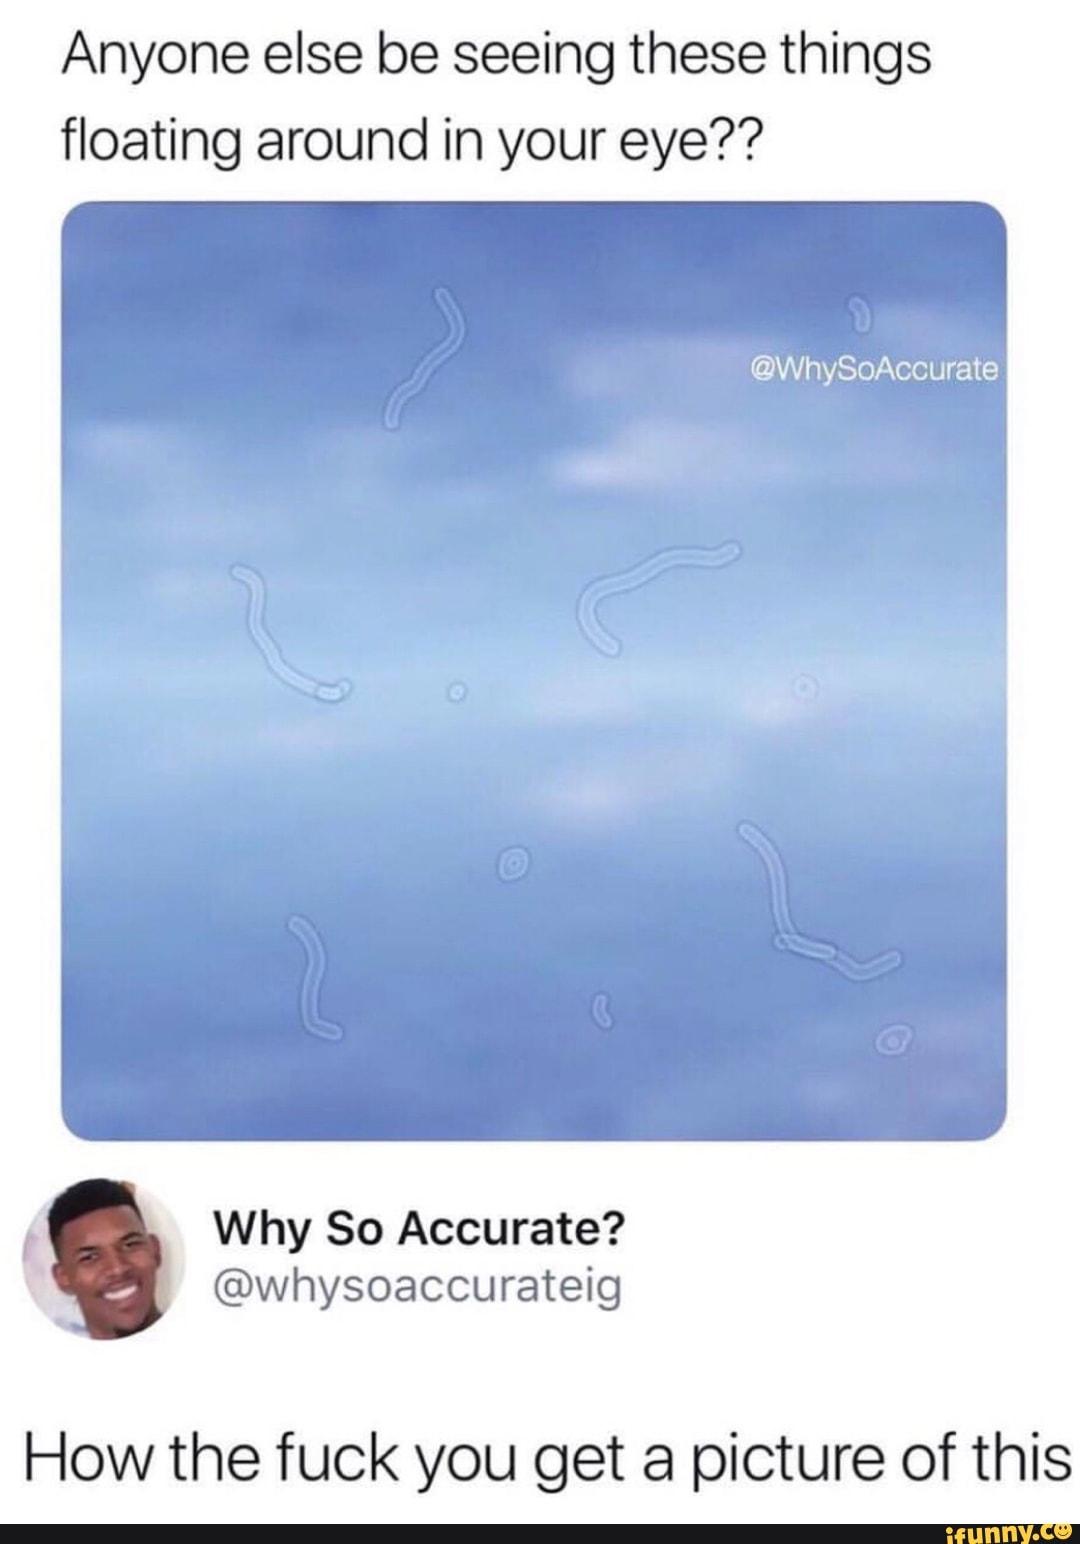 How to fuck around